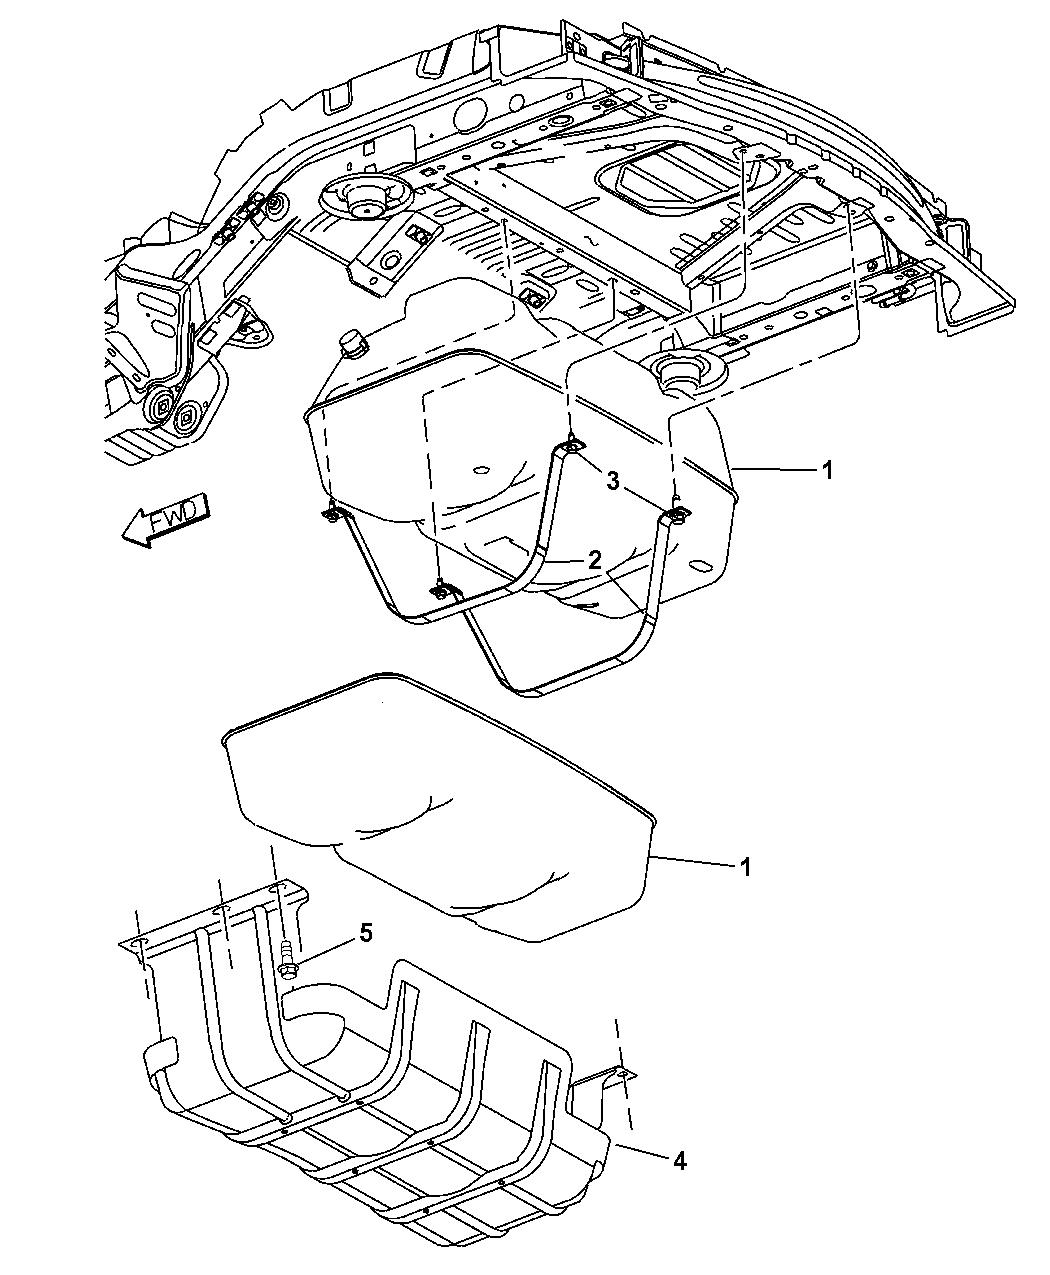 2006 Jeep Liberty Fuel Tank